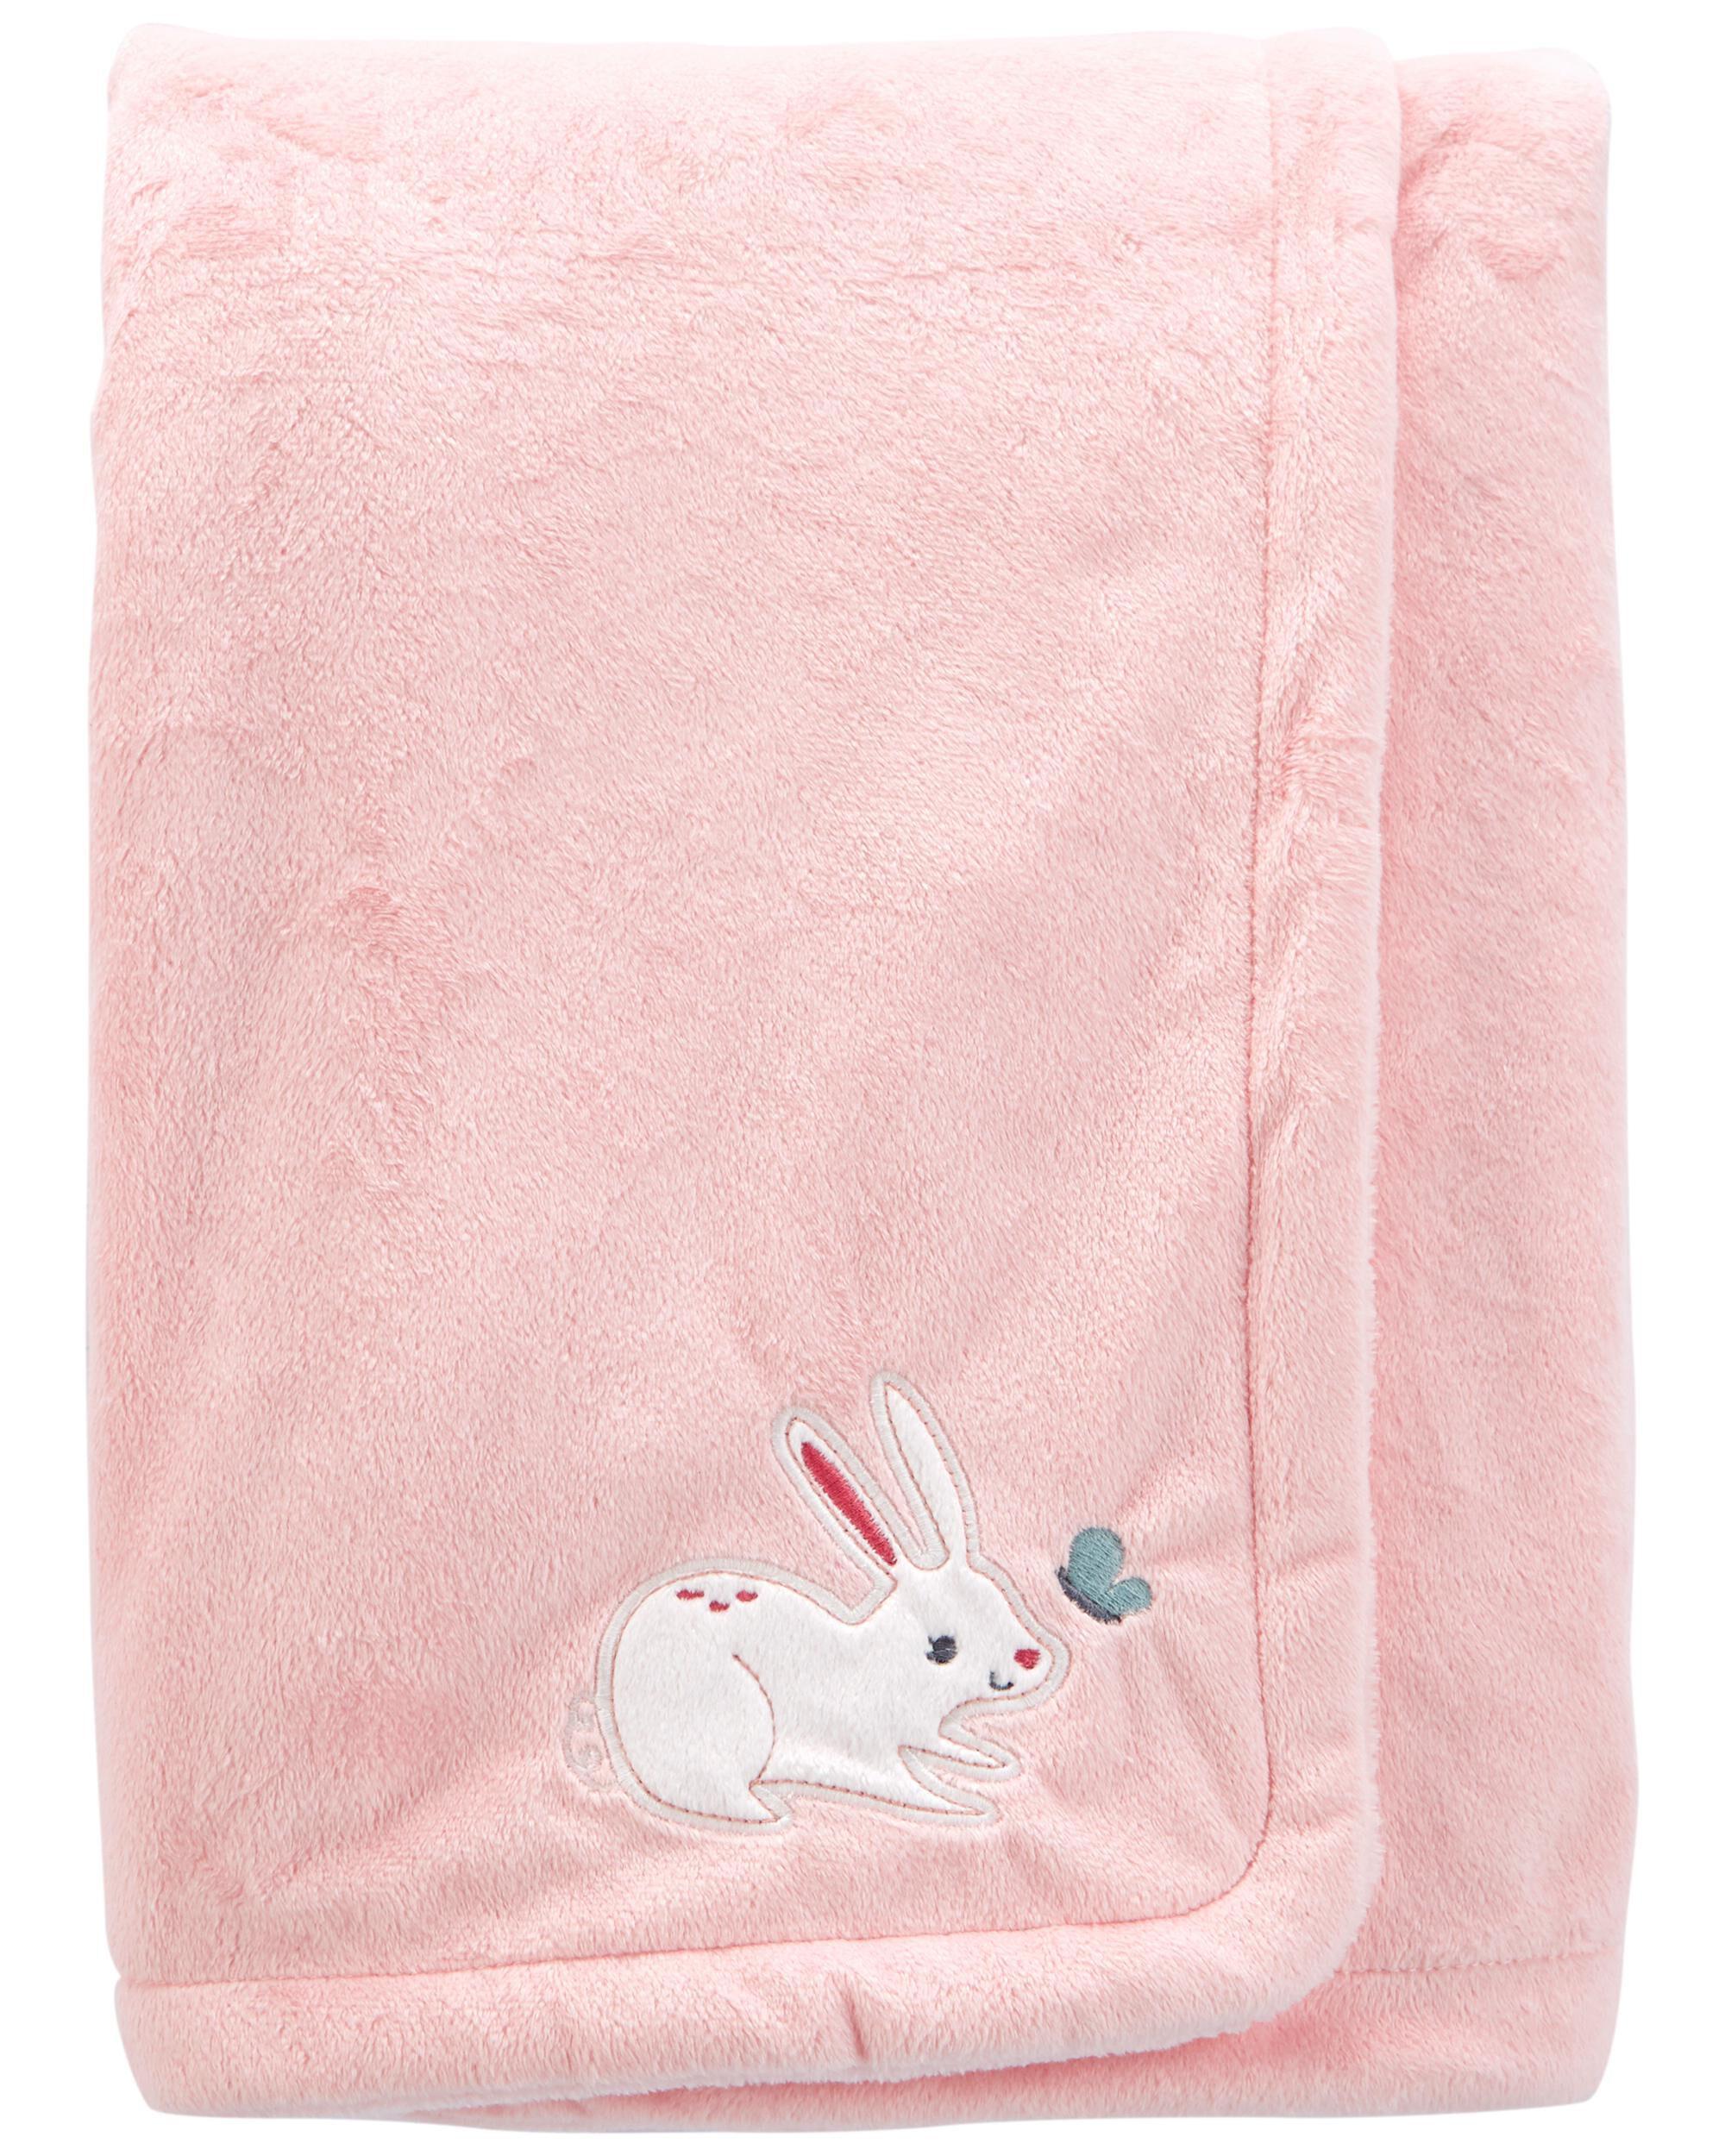 Carters Bunny Fuzzy Plush Blanket